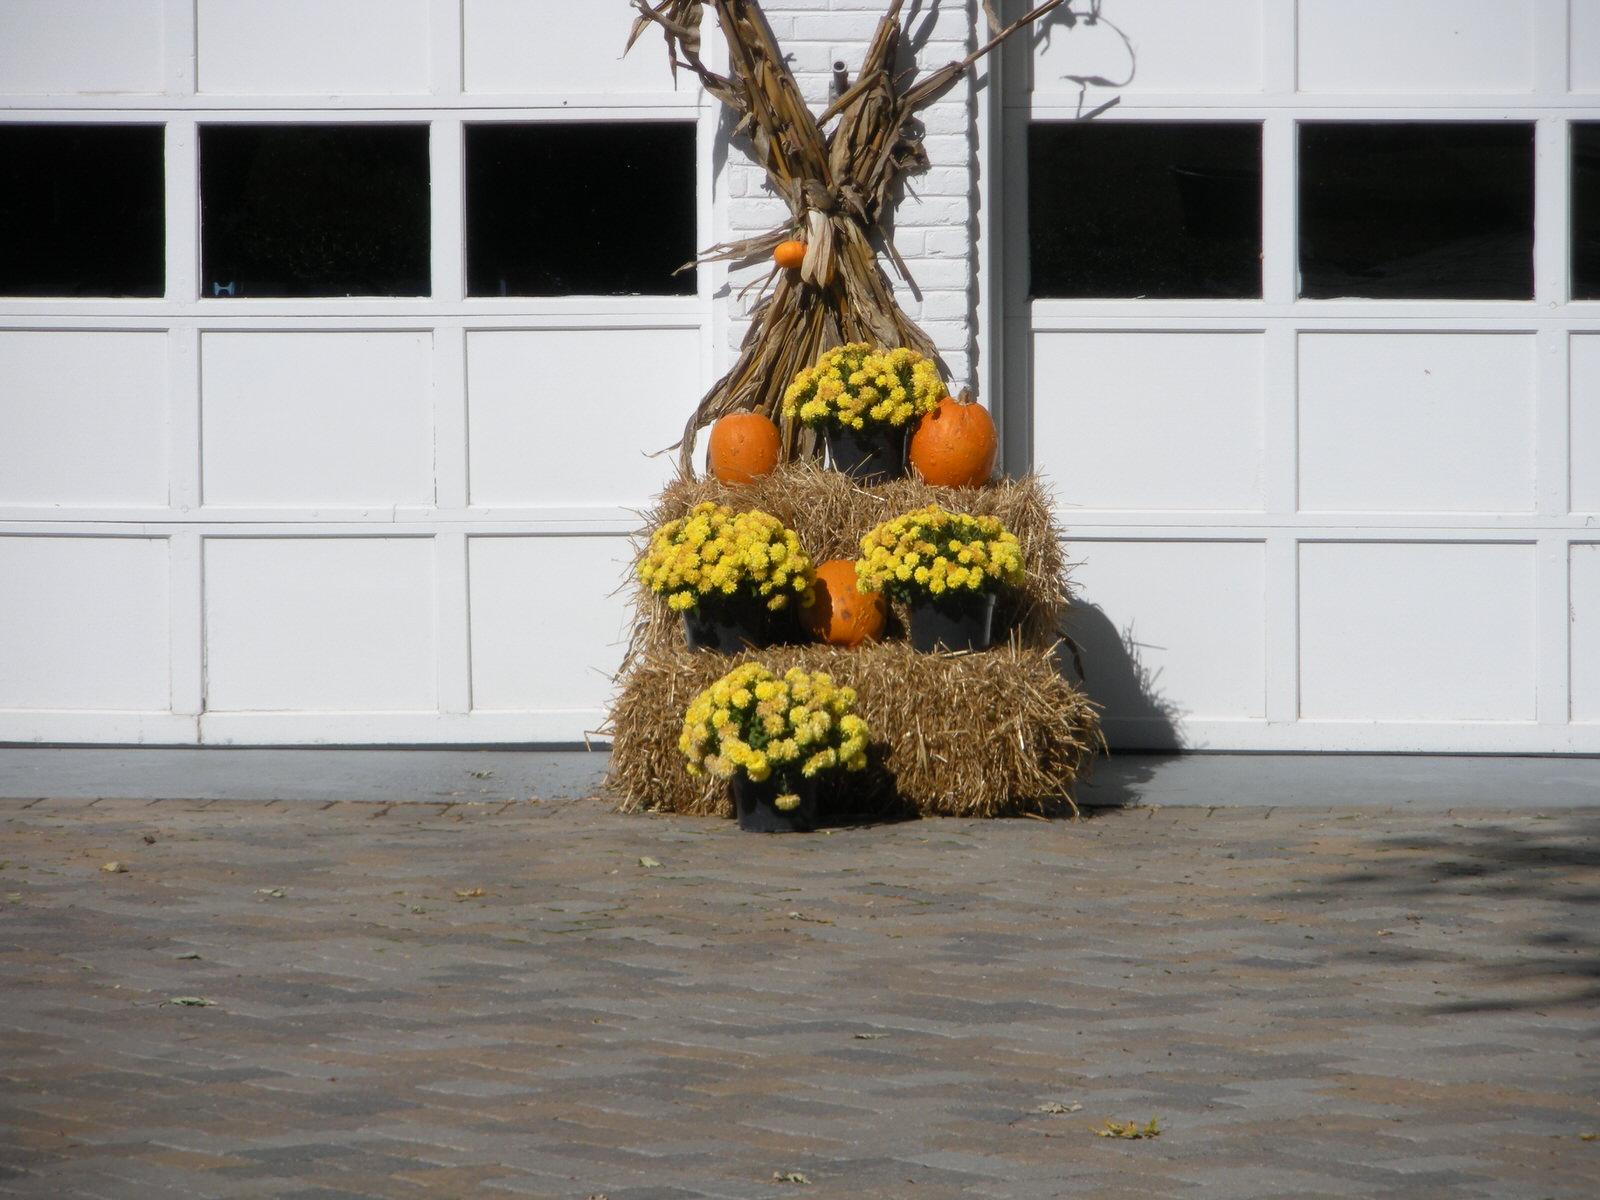 Justin Stelter Landscape Gardening - Seasonal Decorations - 12465433975_1e9bed96aa_o.jpg